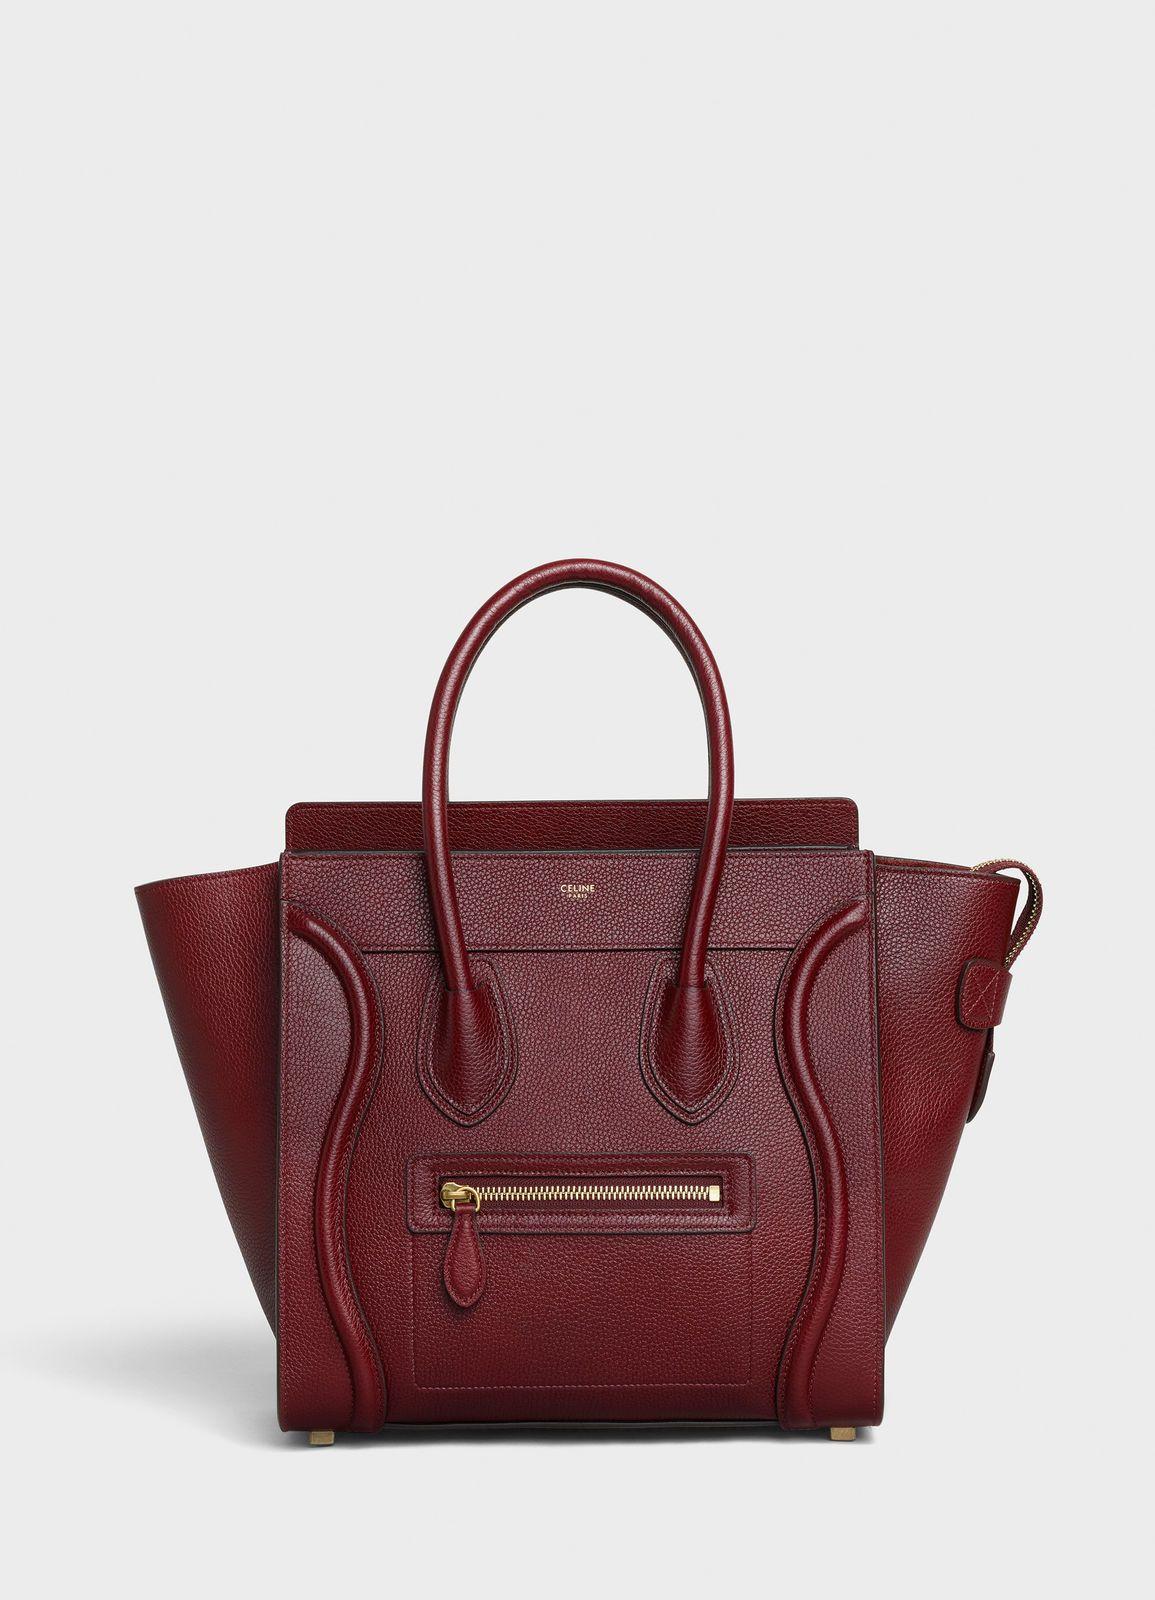 f3c86c6005f83 Micro Luggage handbag in drummed calfskin